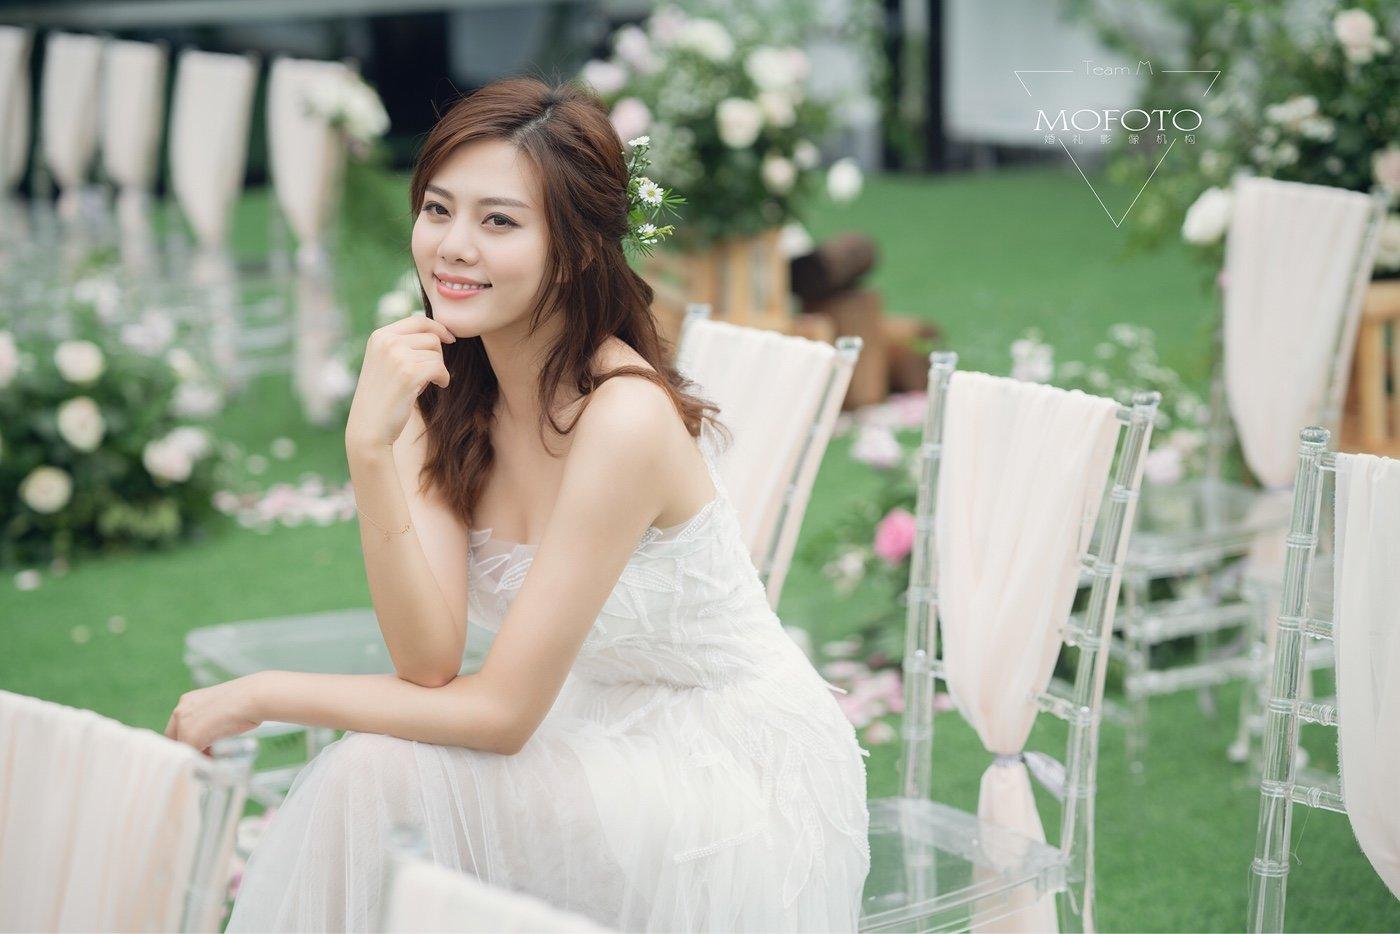 MoFoTo 婚礼拍摄4